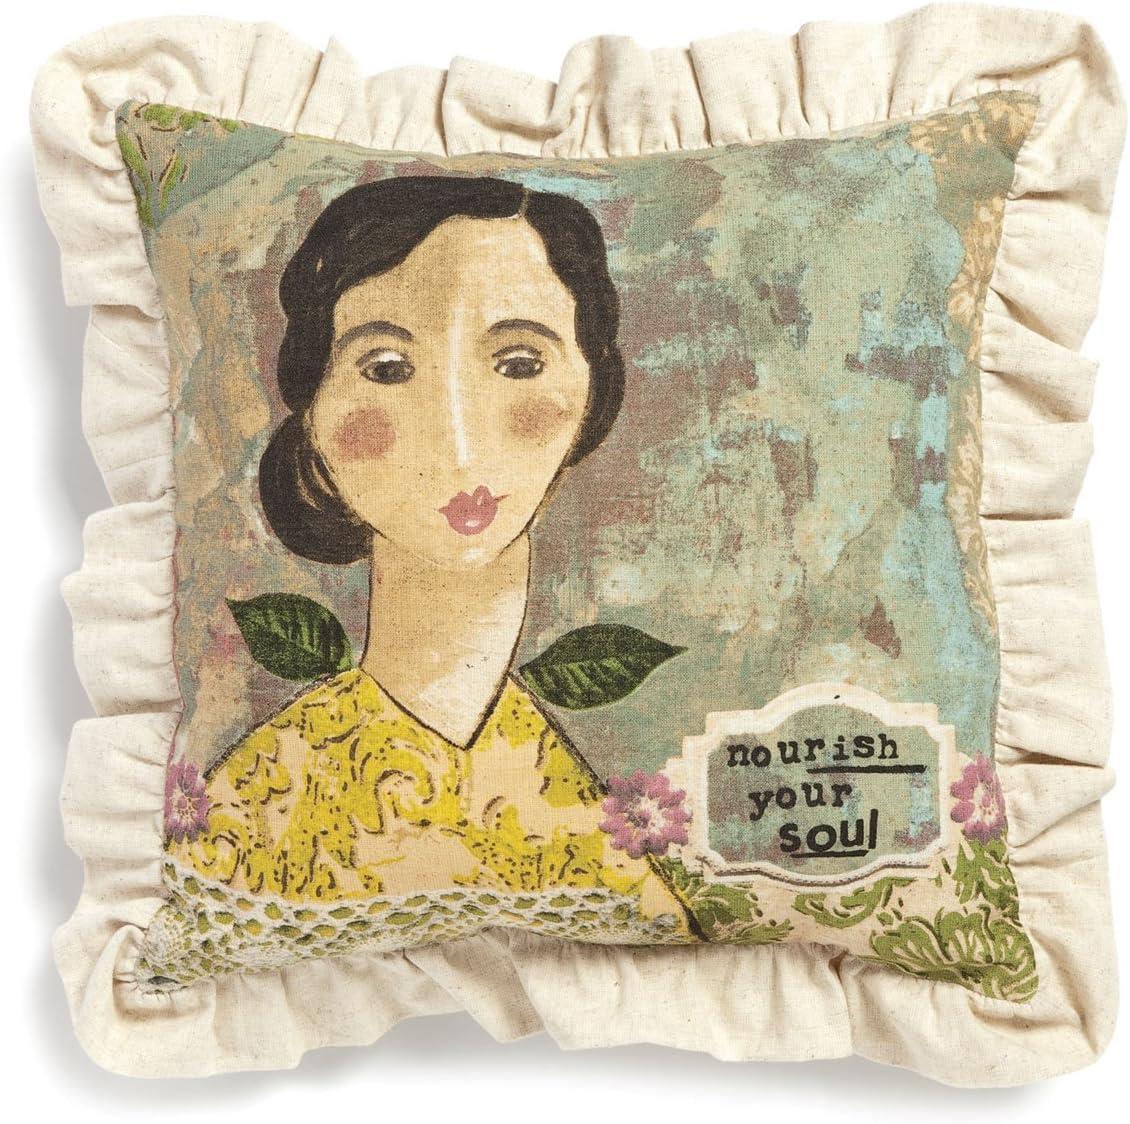 DEMDACO Nourish Your Soul Pillow